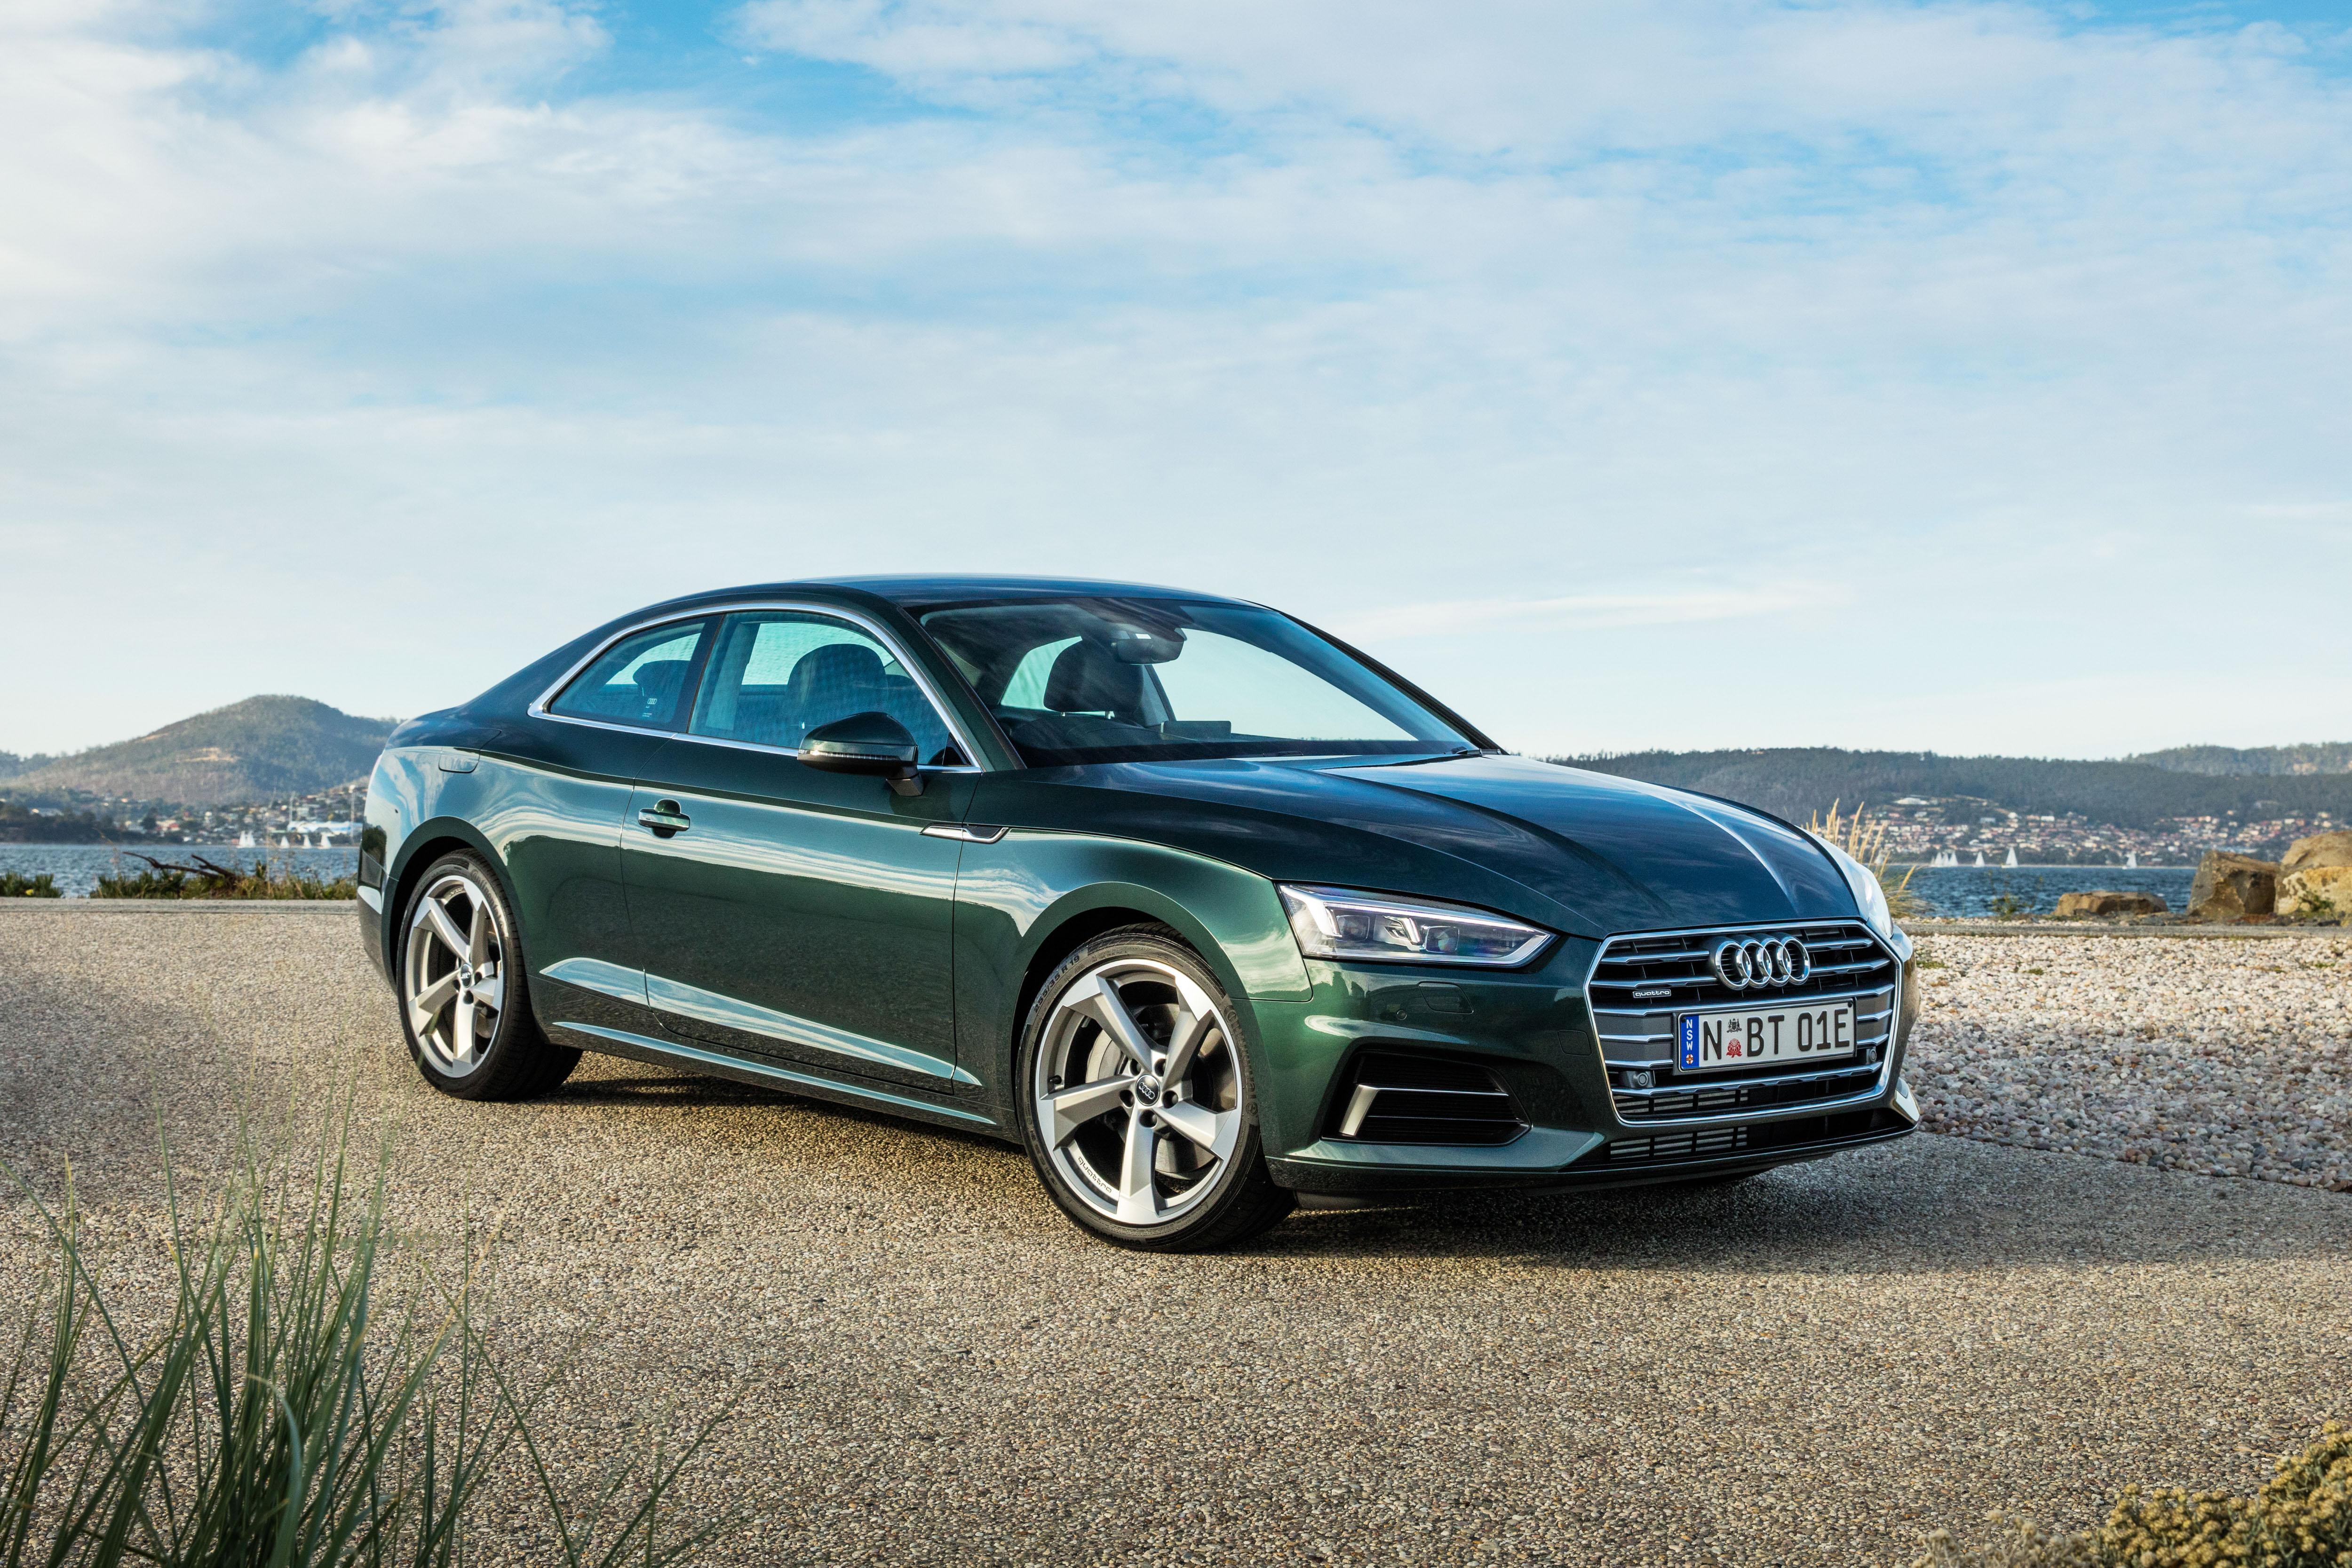 2017 Audi A5 2.0 TFSI quattro S tronic